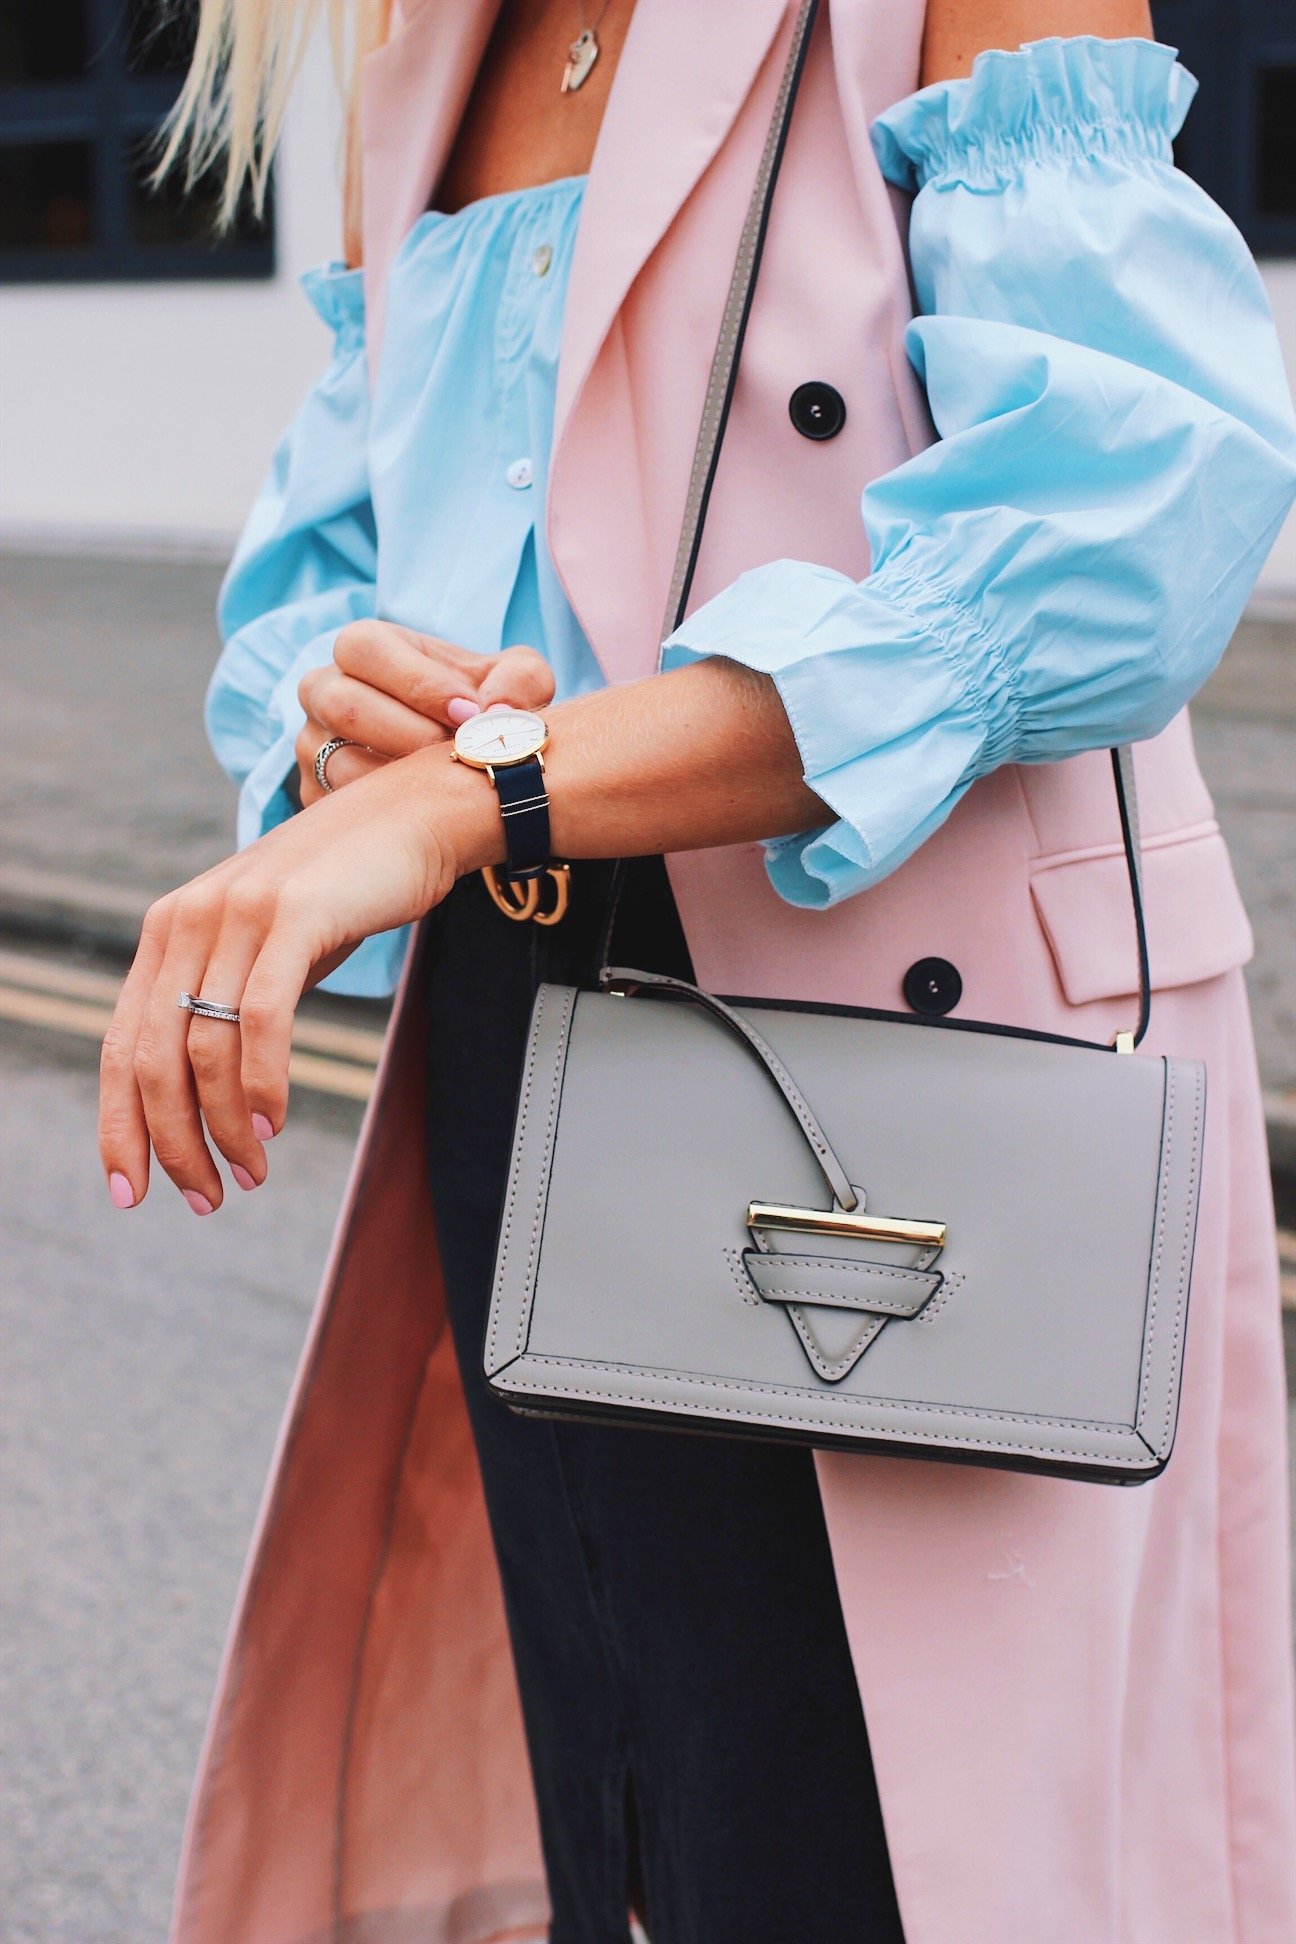 Affordable fashion blog lurchhoundloves